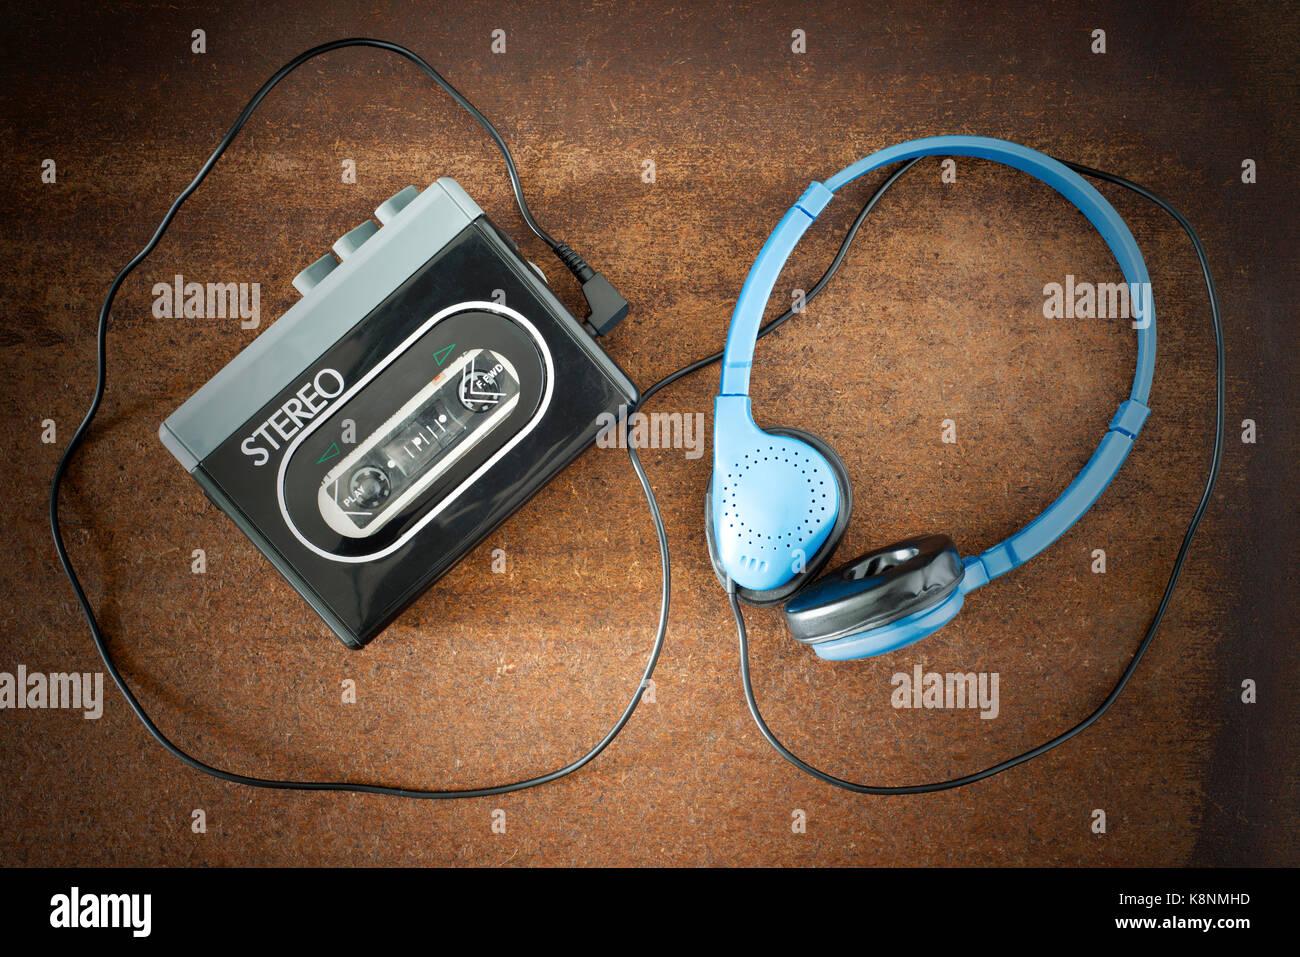 Vintage walkman and headphones. - Stock Image